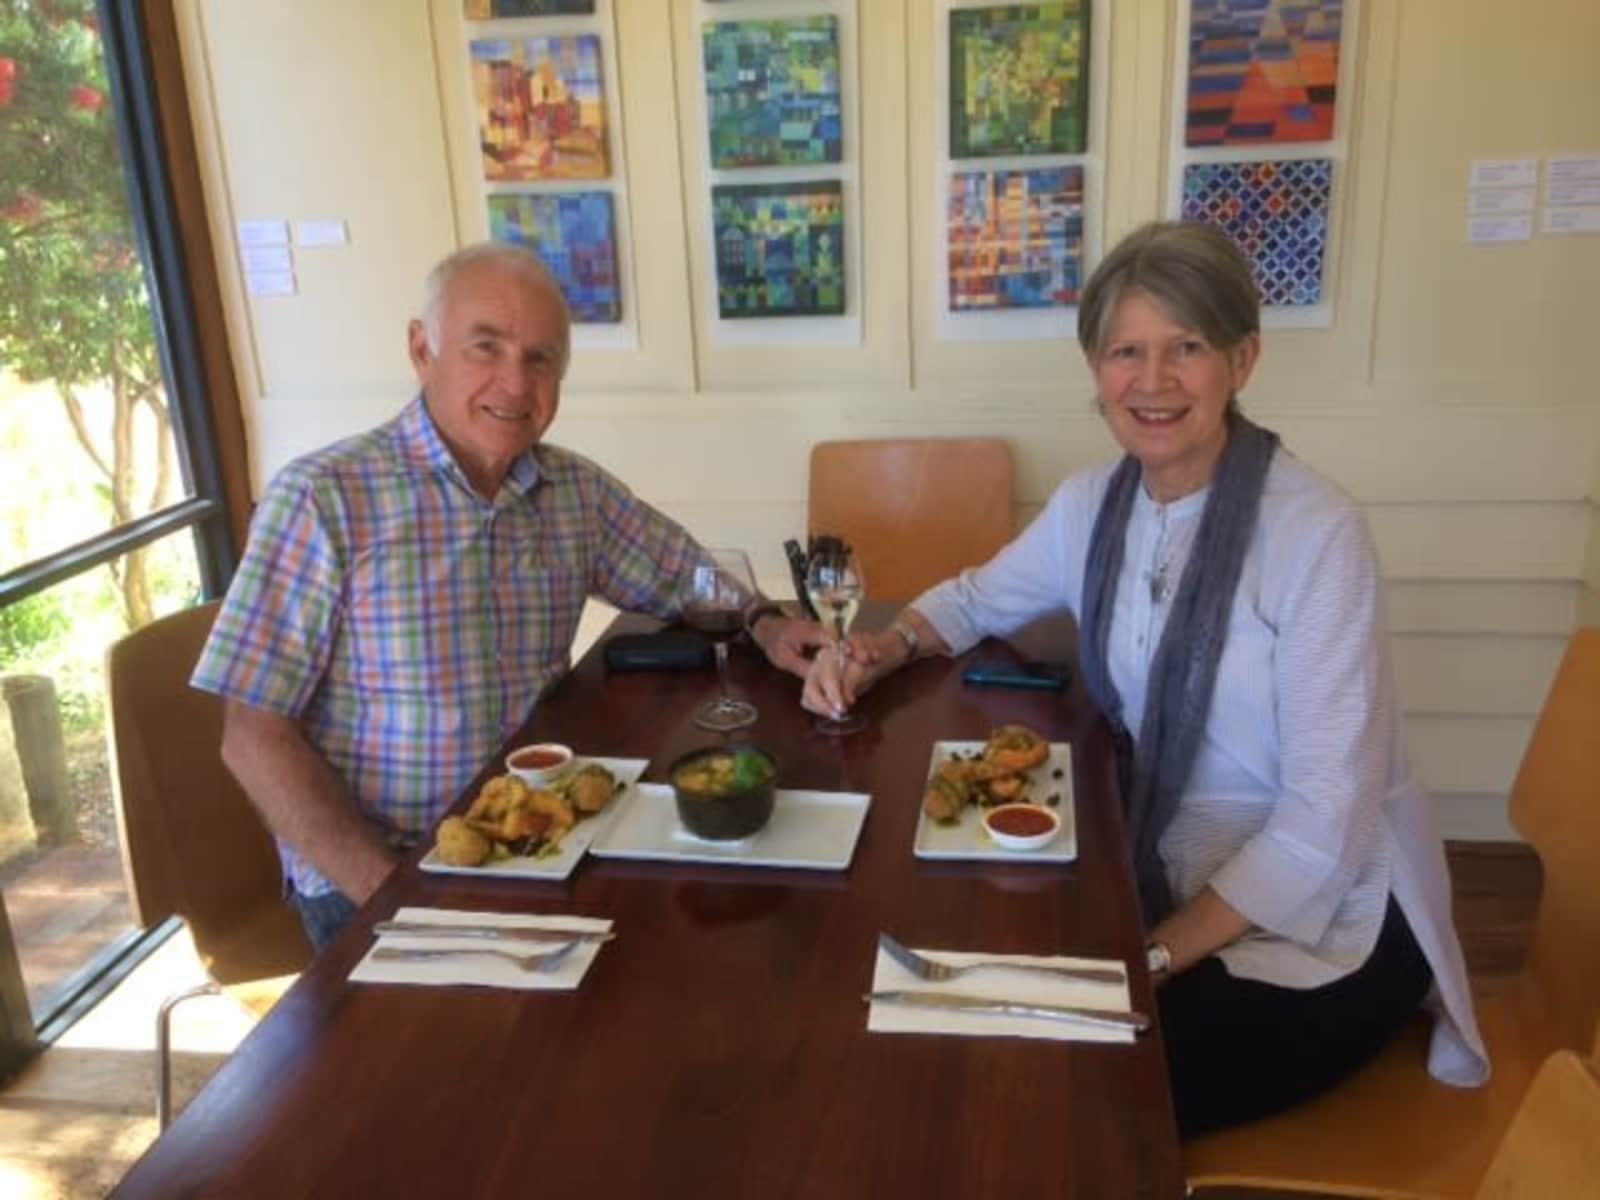 Kevin & Linda from Perth, Western Australia, Australia